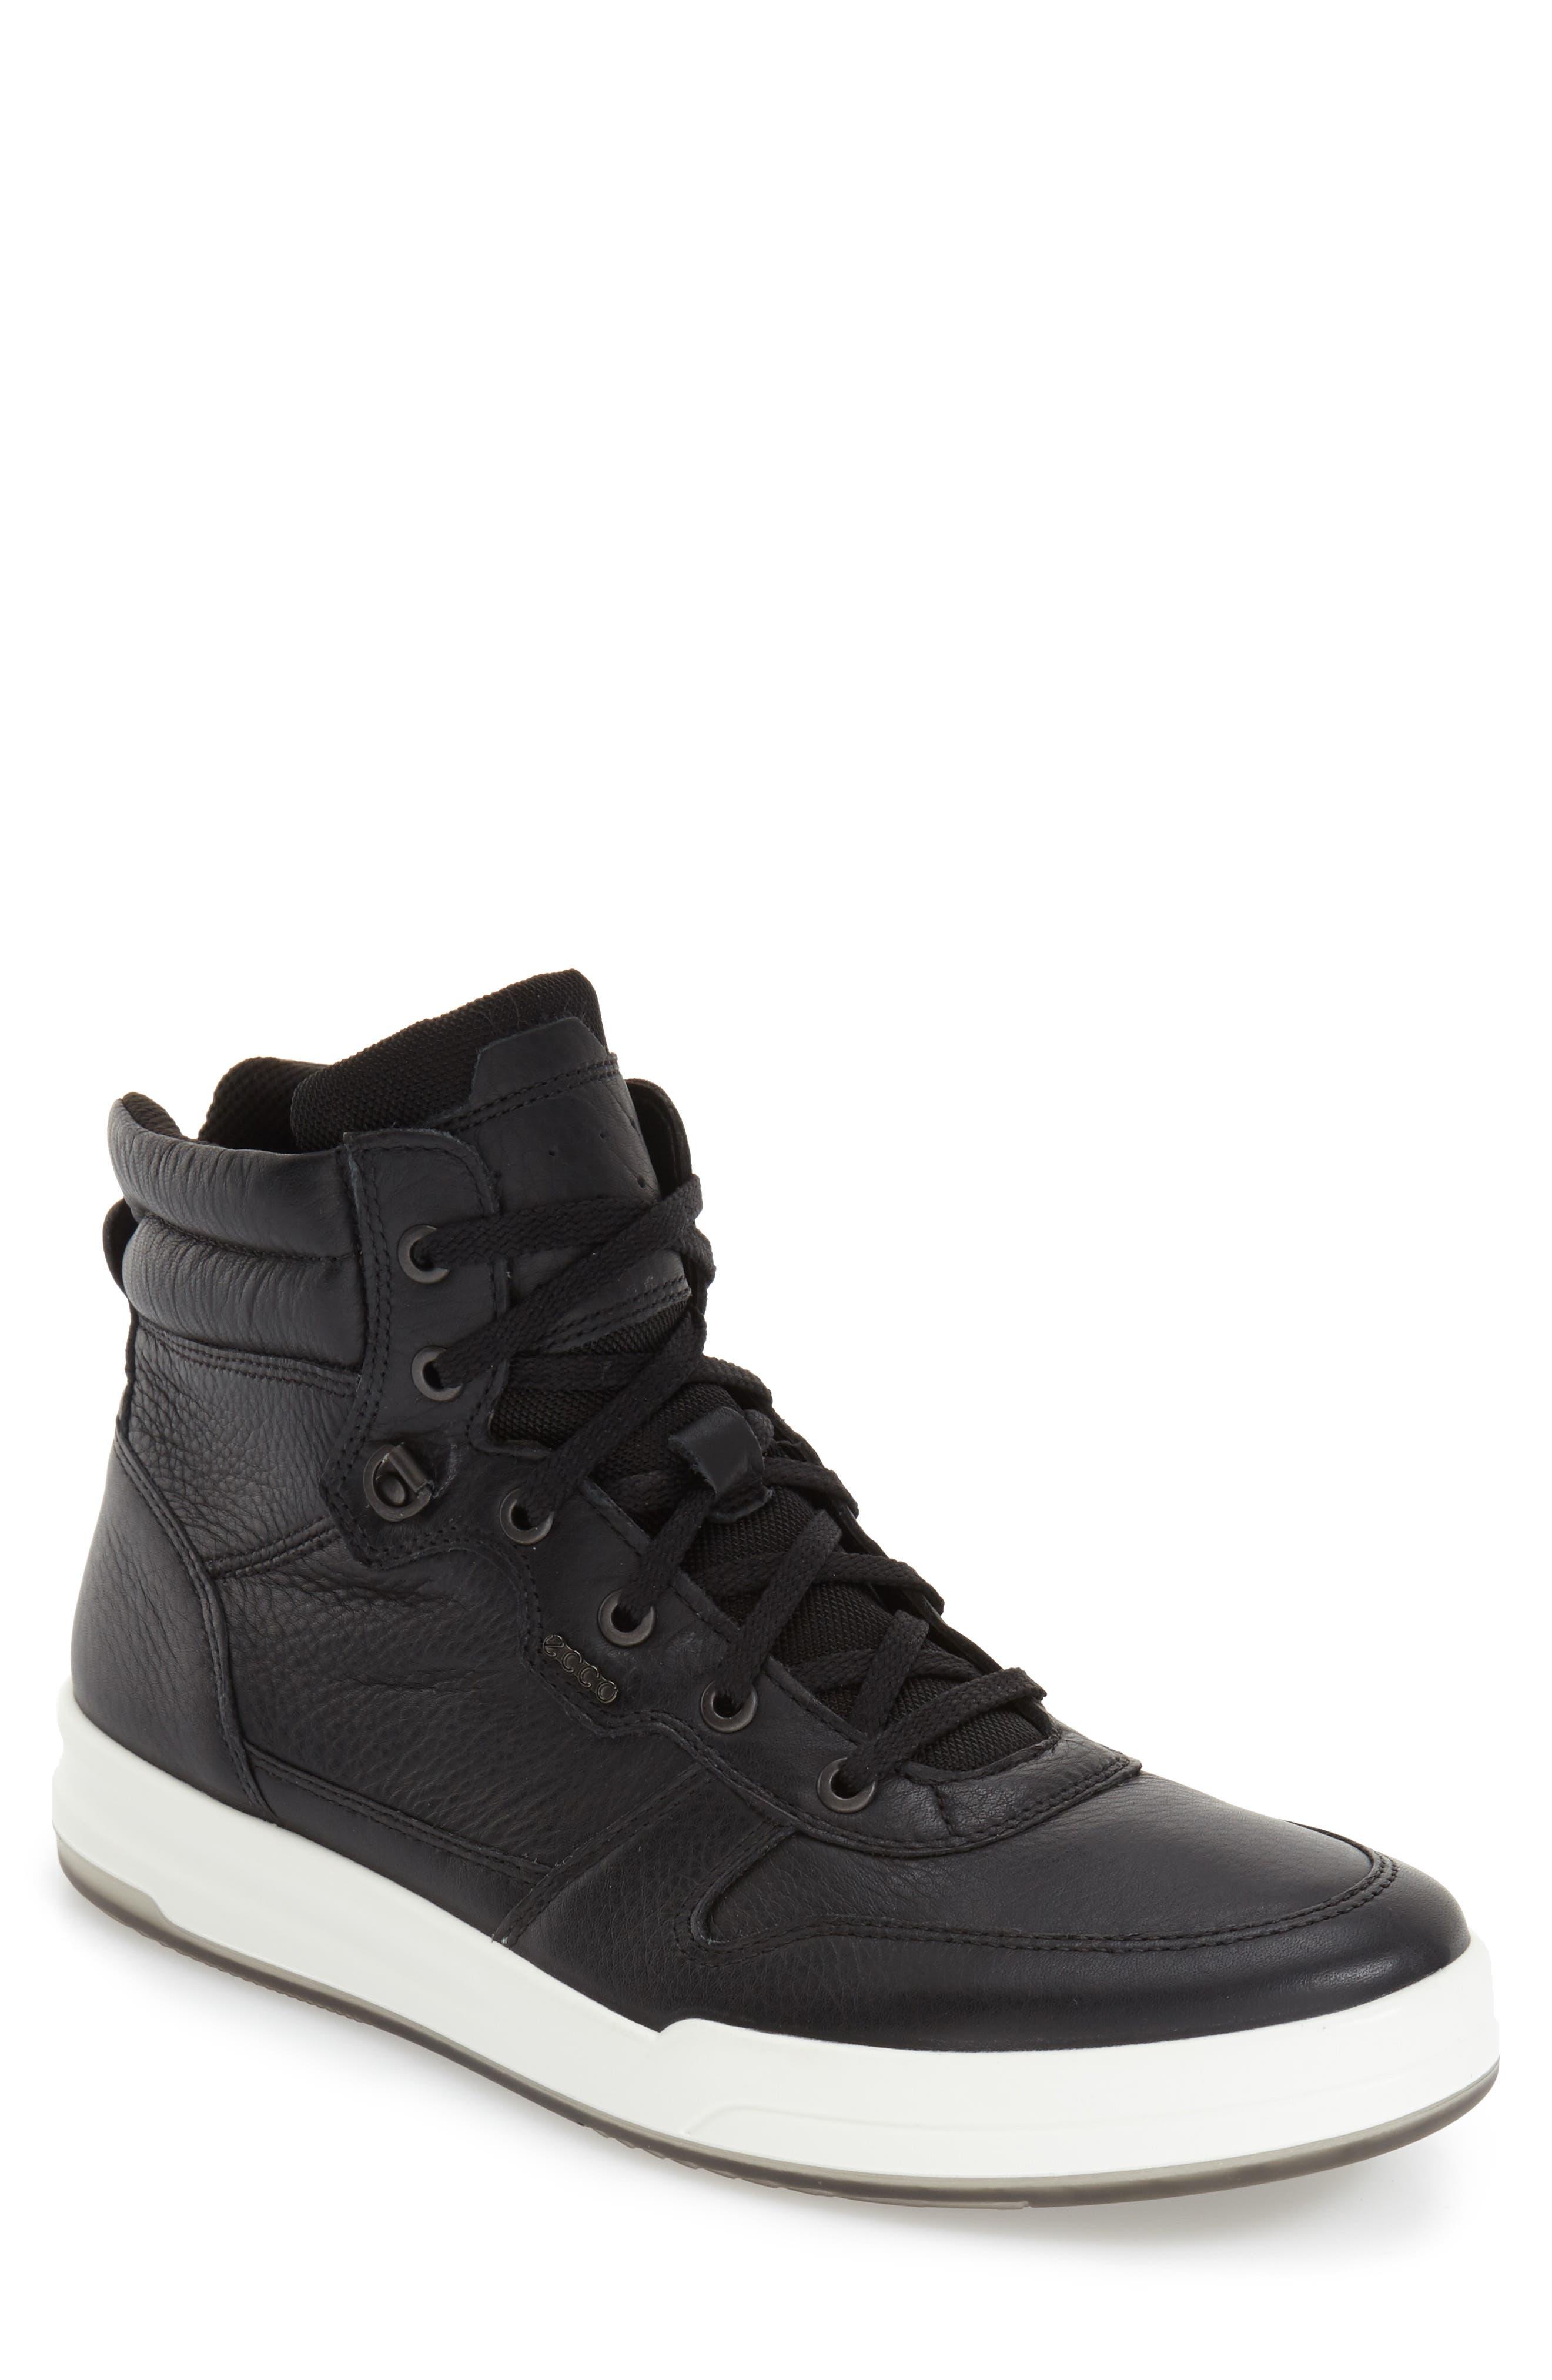 'Jack' High Top Sneaker,                             Alternate thumbnail 6, color,                             001